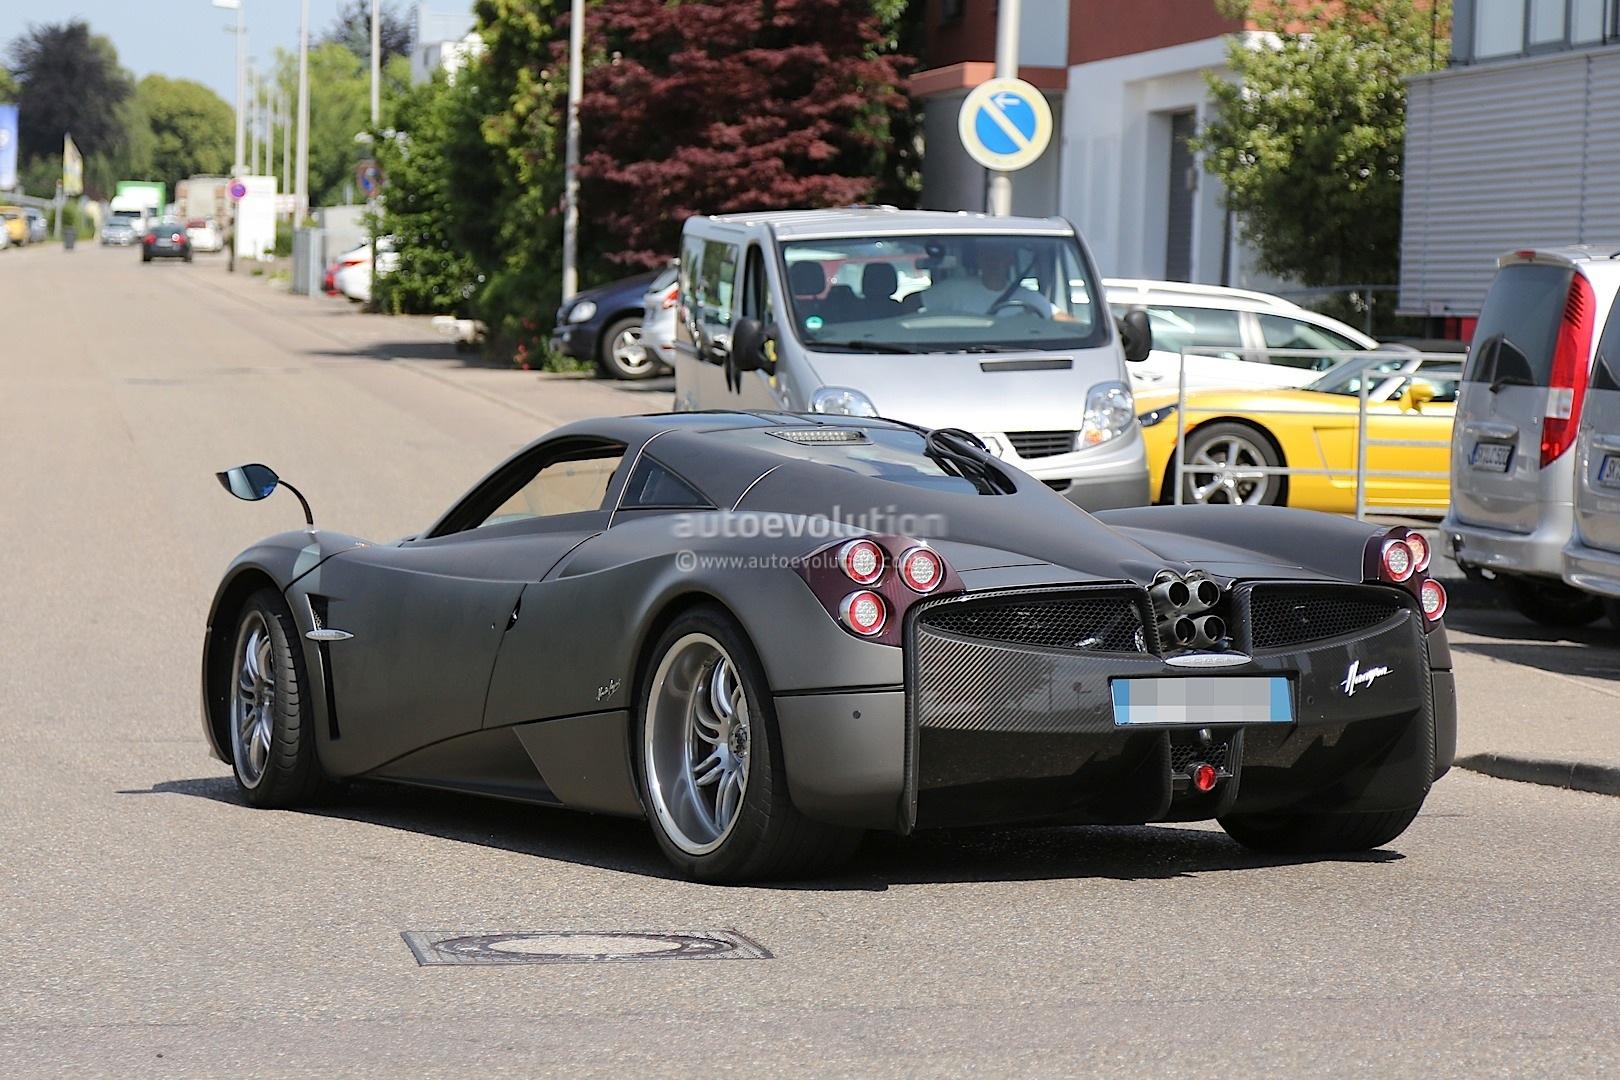 Pagani Huayra Nurburgring Edition Spied Testing More Powerful AMG ...